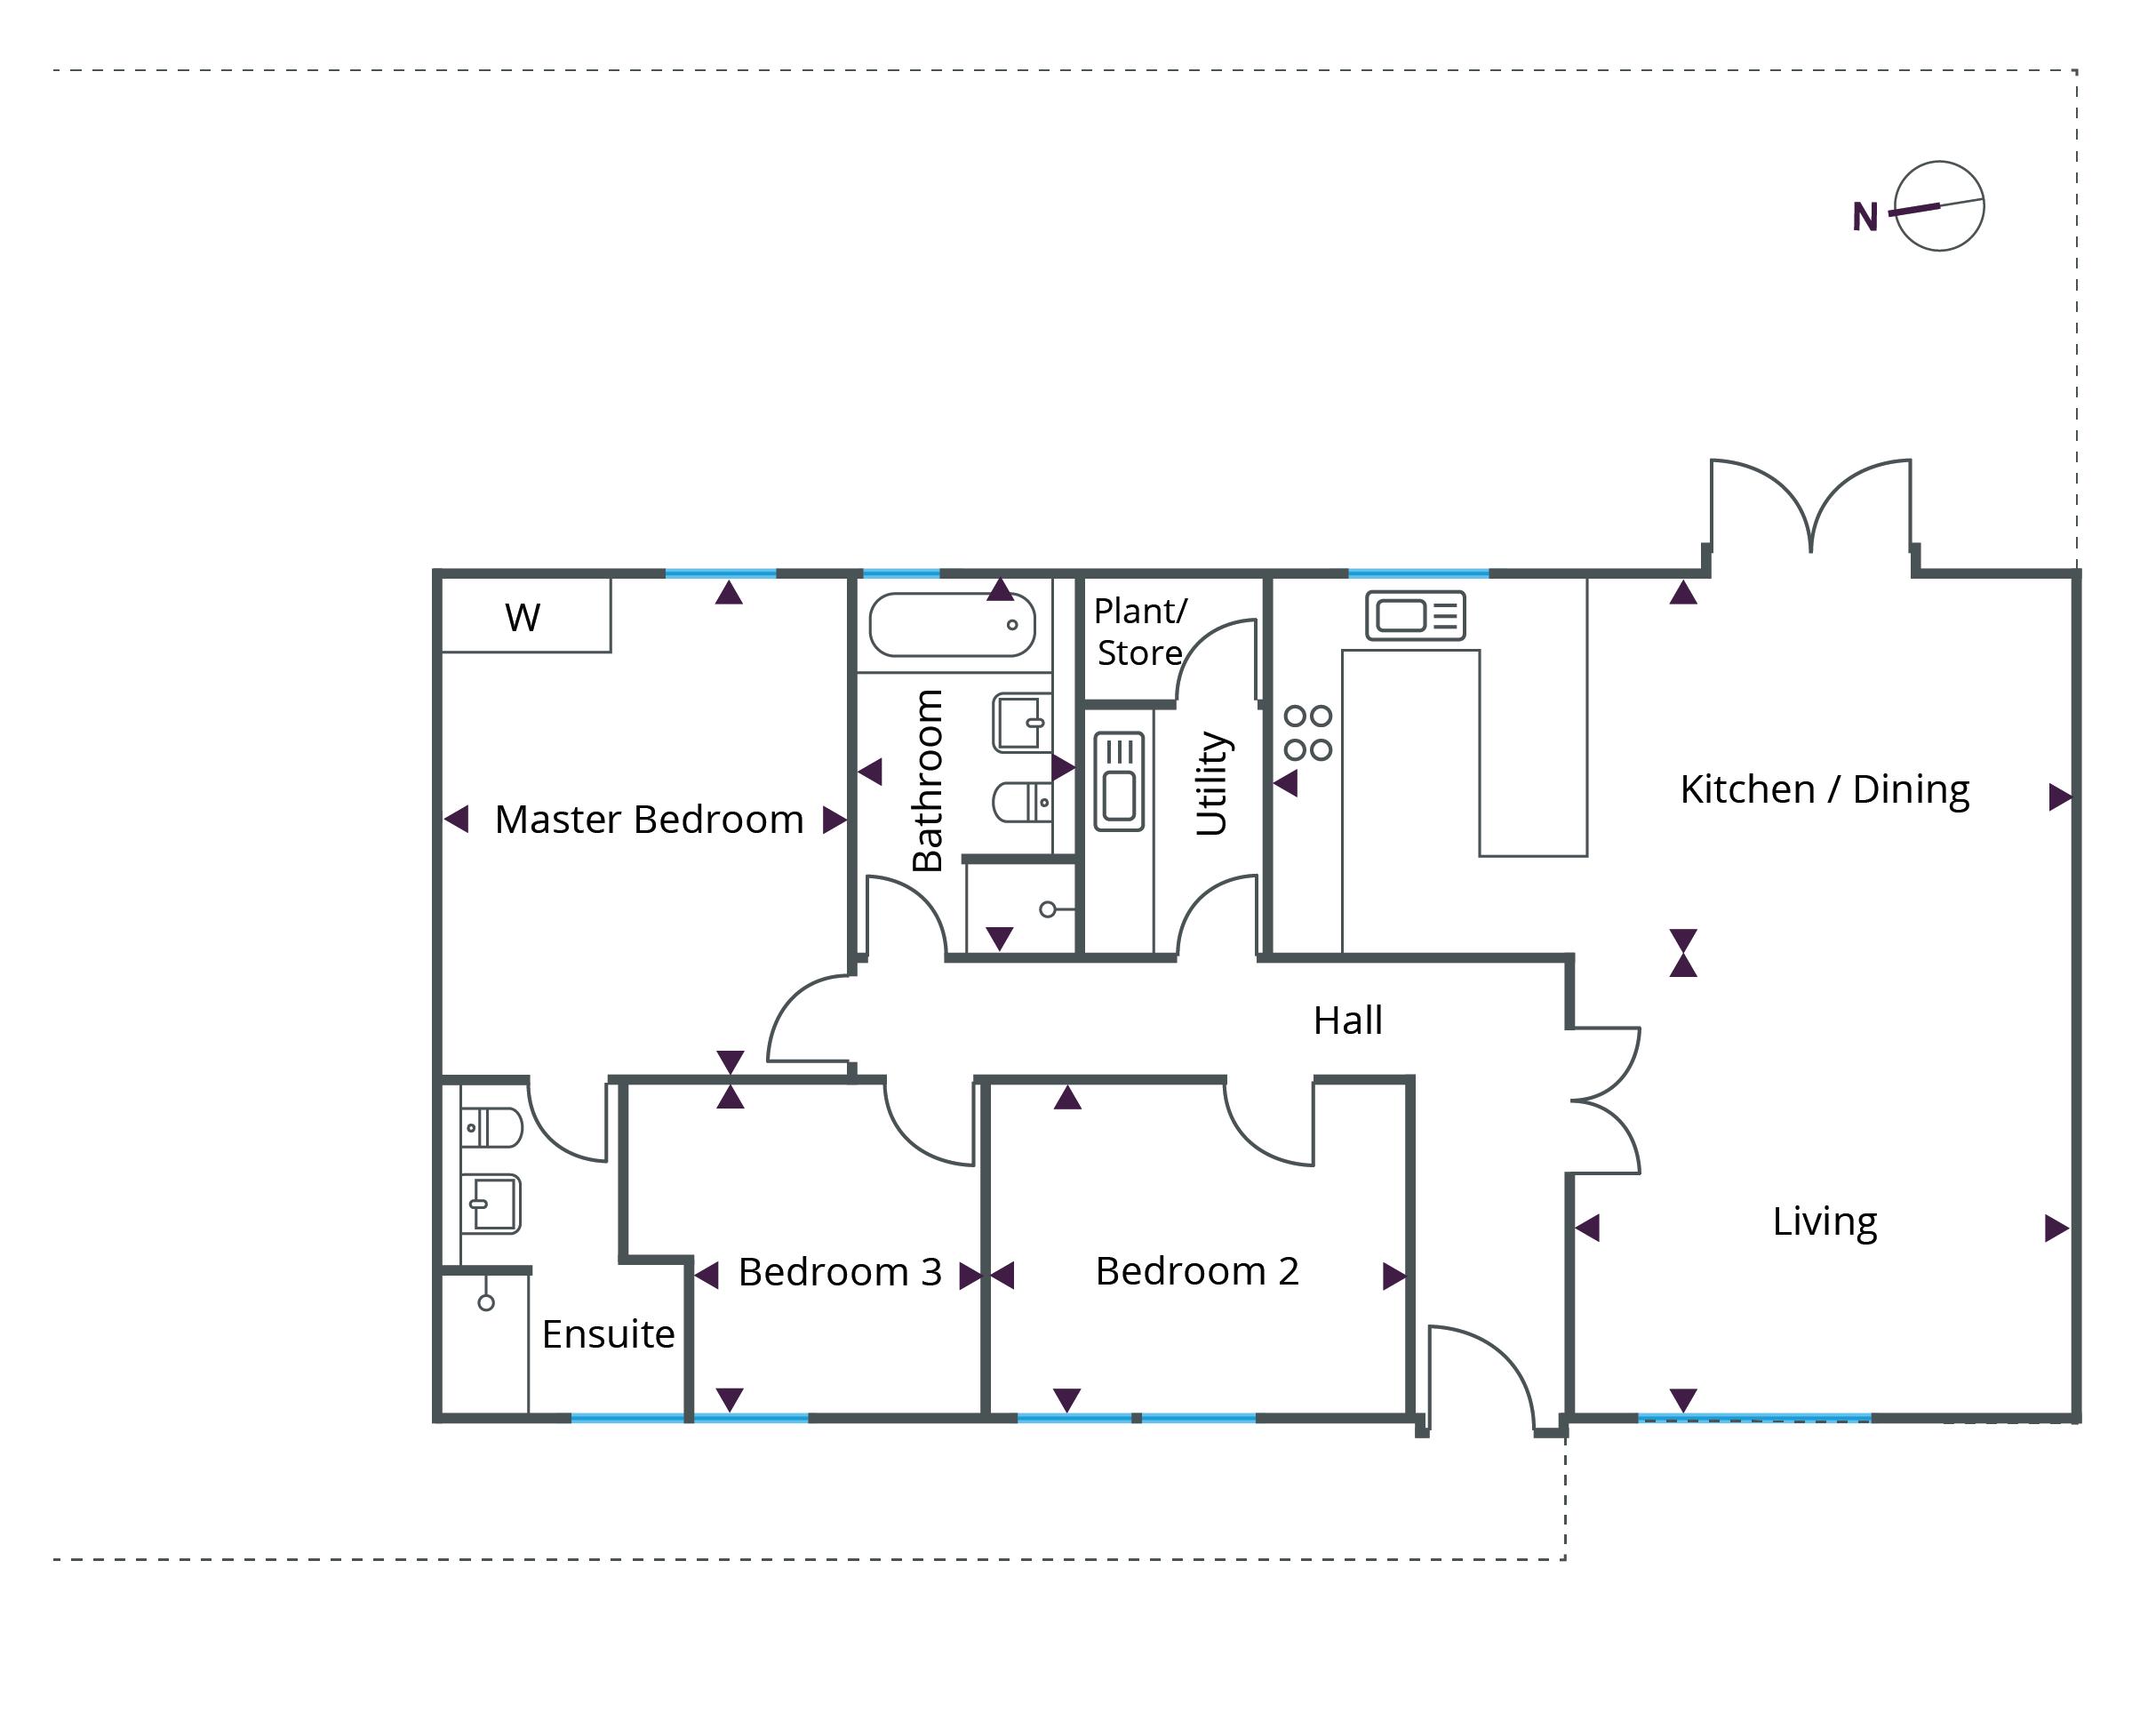 Floorplan for Bungalow 2